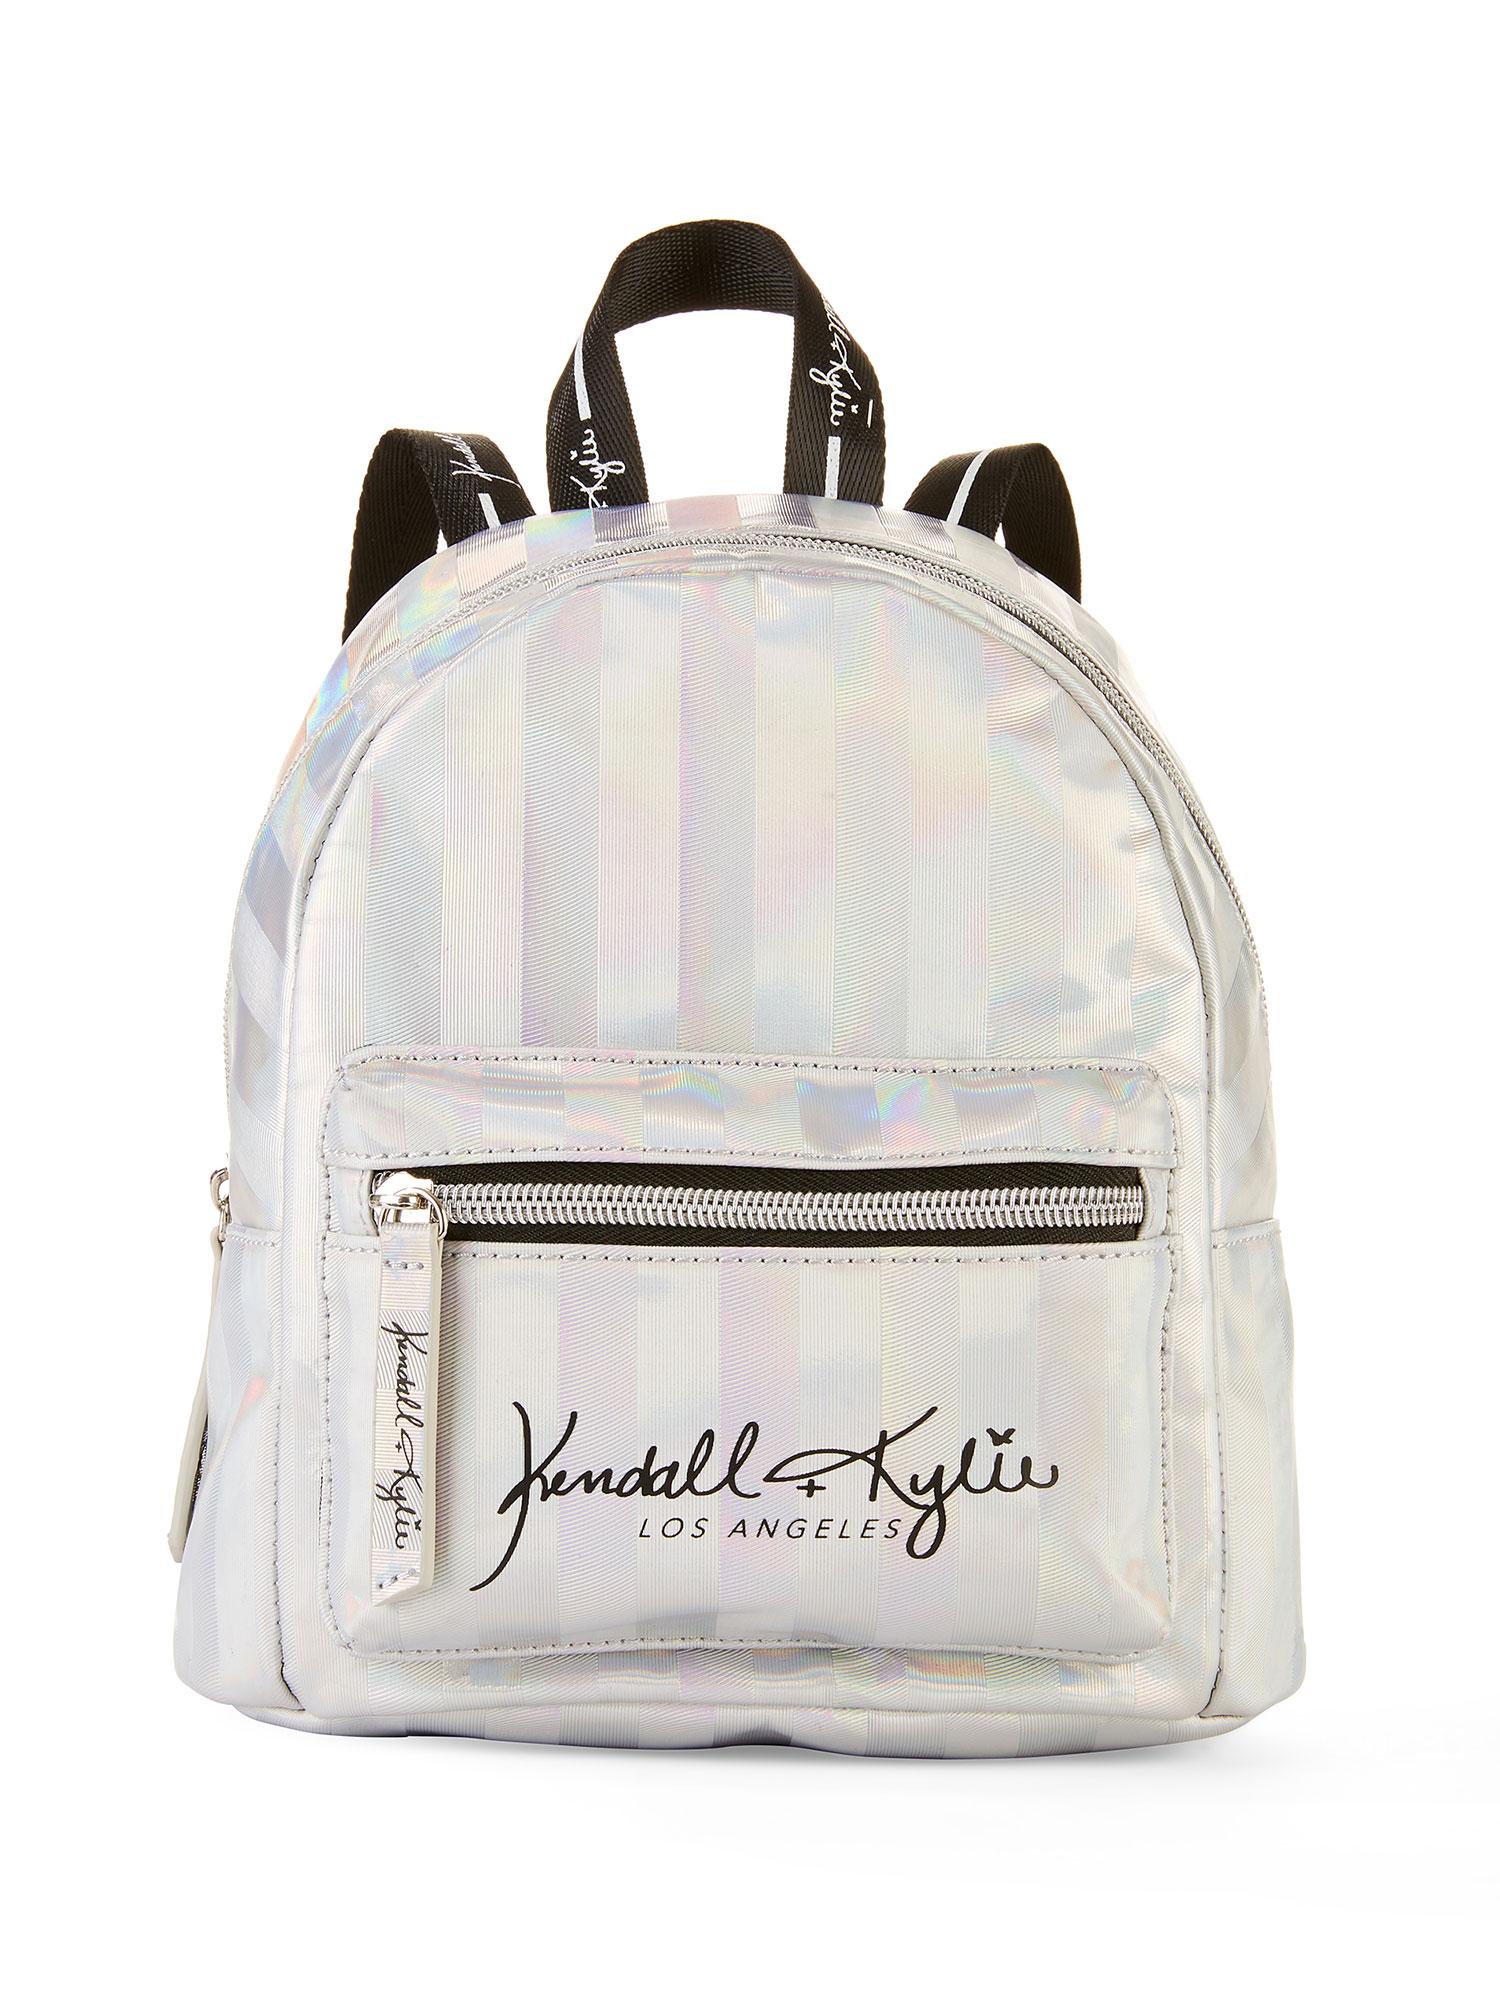 Kendall X Kylie Jenner Spring 2019 Handbag Collection Pics